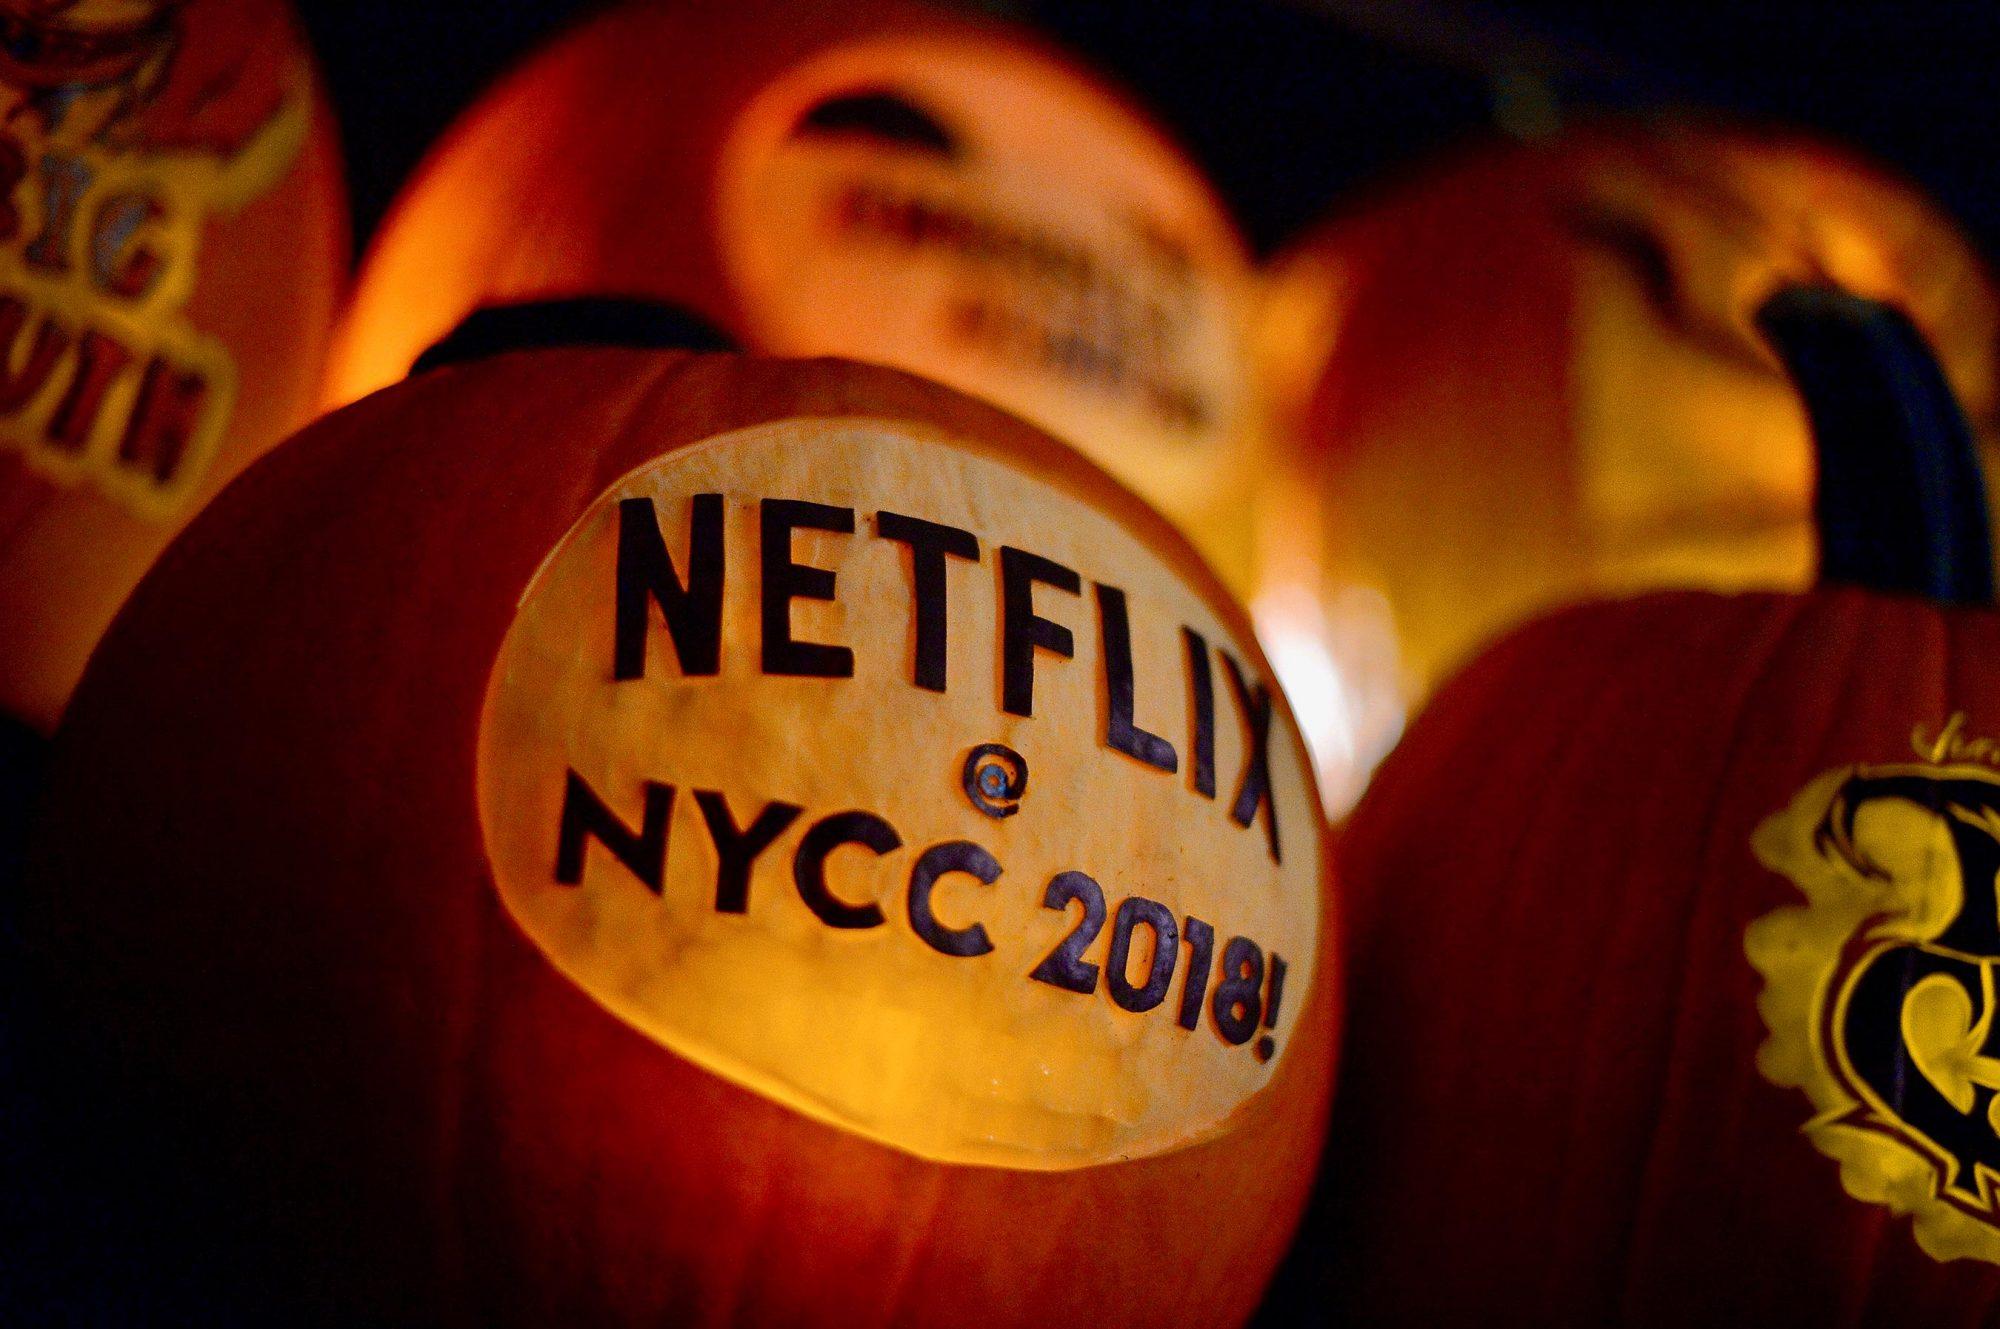 Netflix Previews It's New York comic Con LineupCredit: Netflix